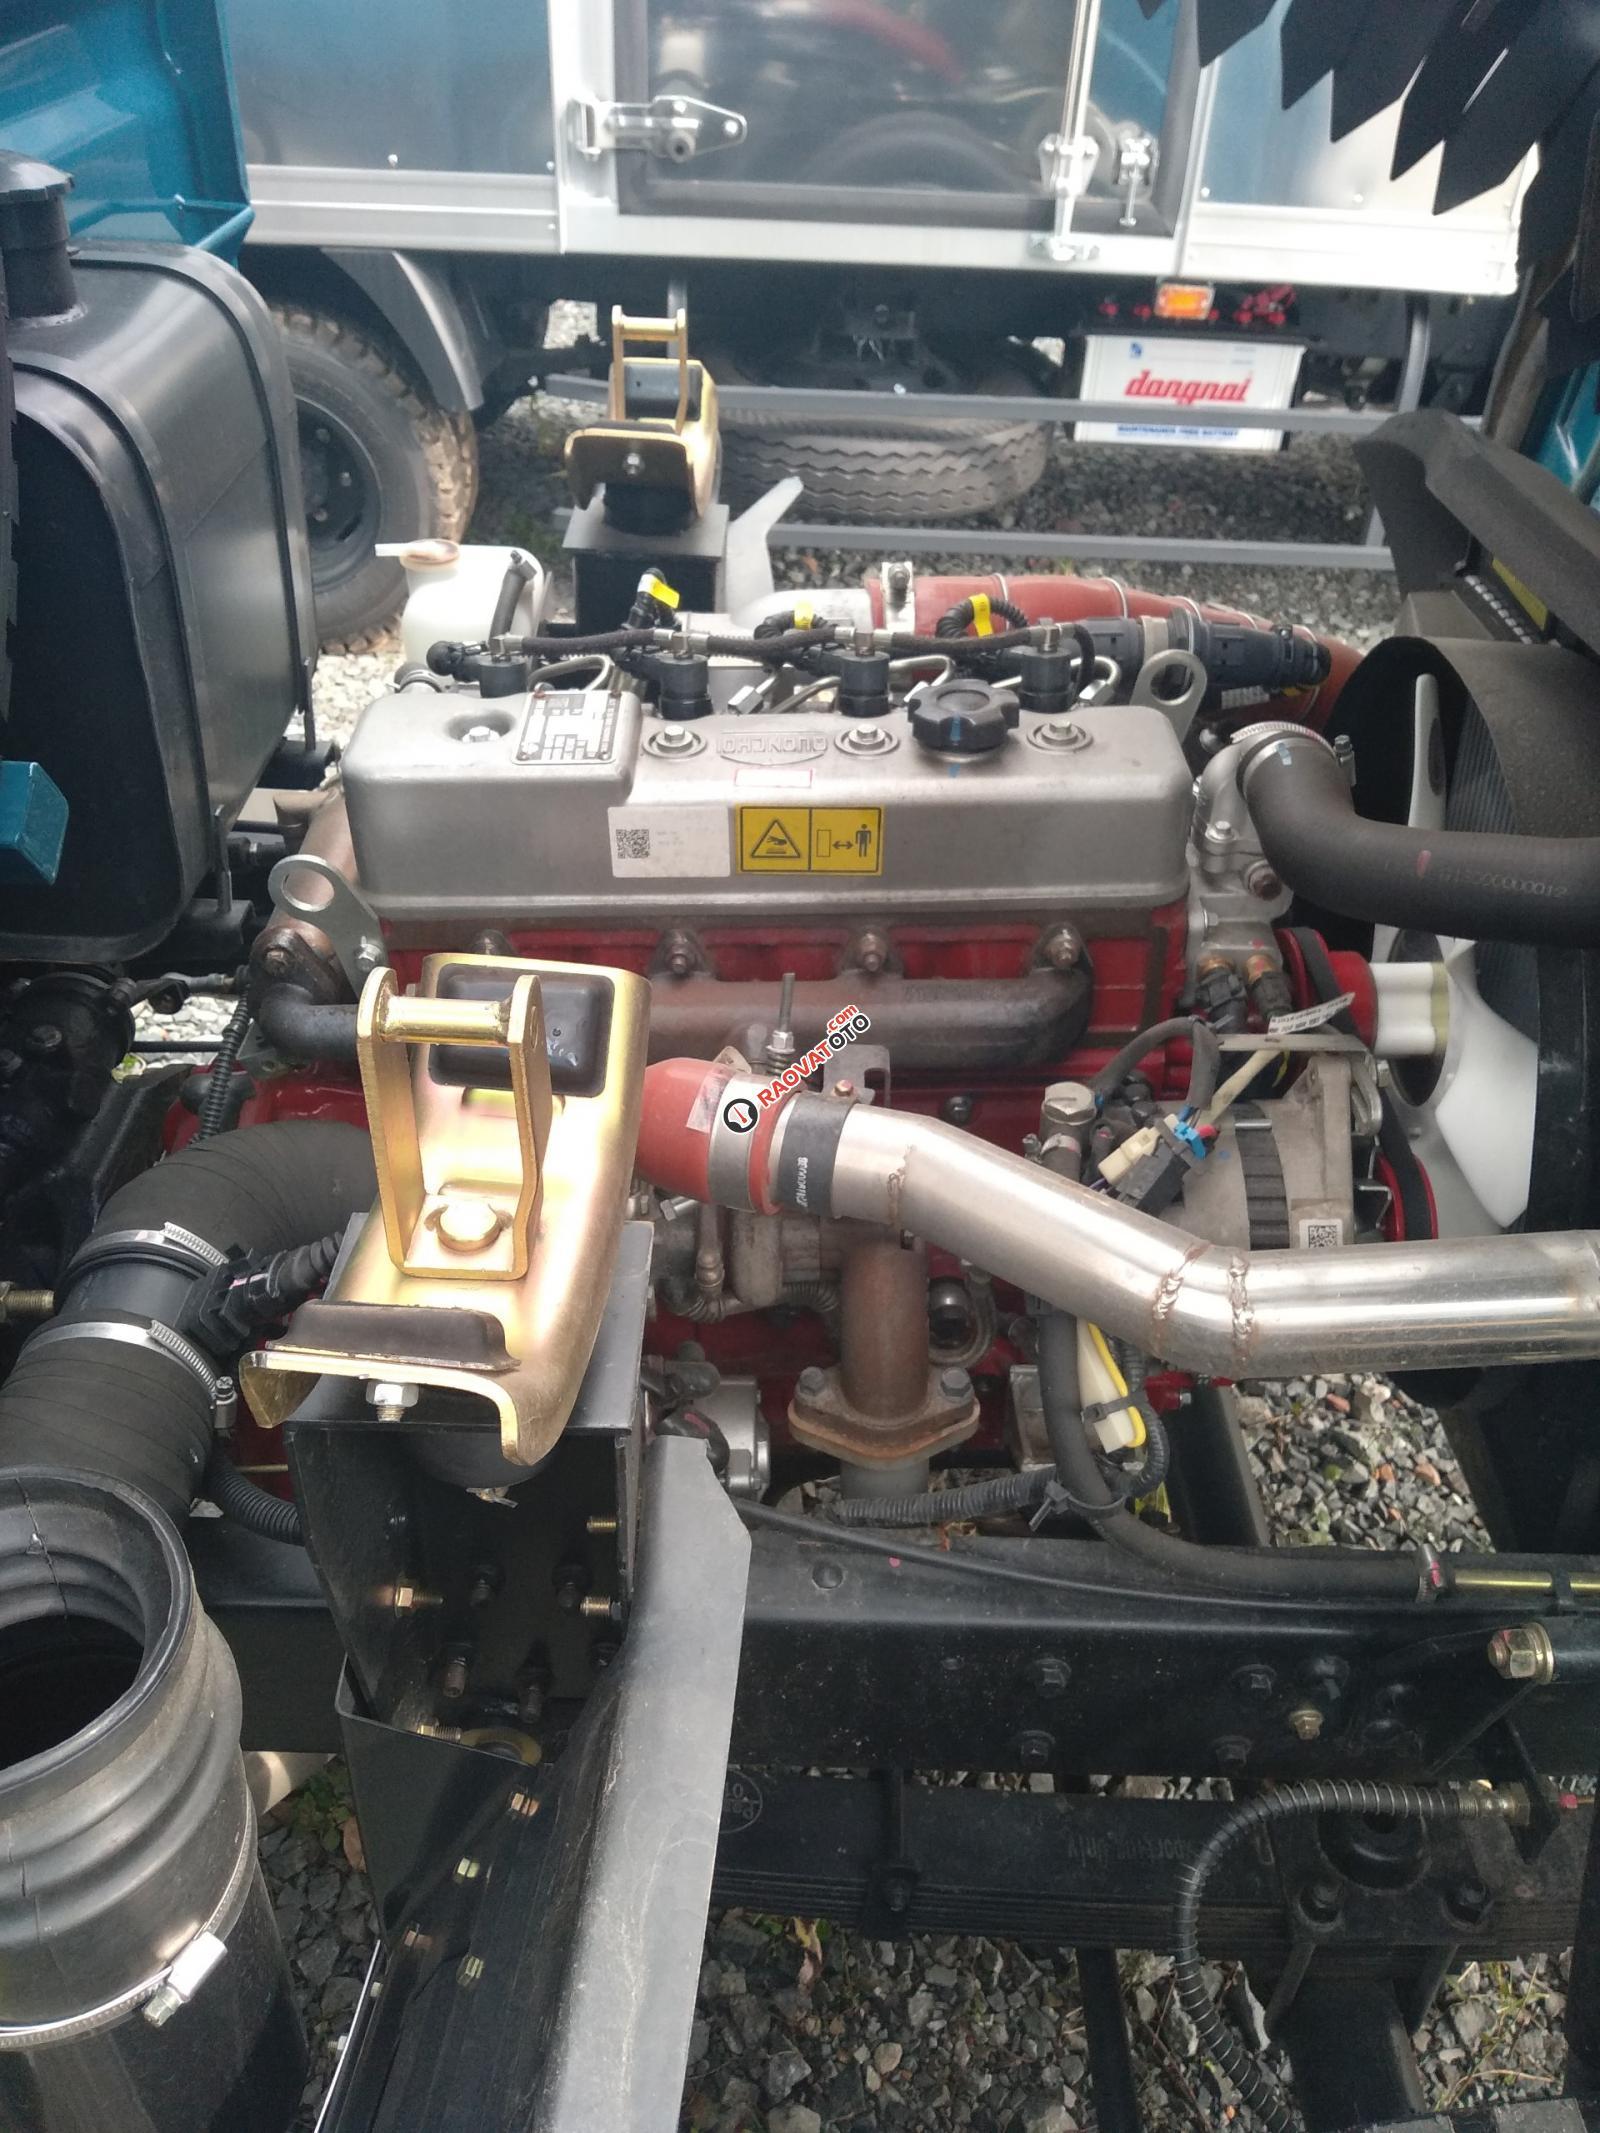 Bán xe ben THACO 2.5 tấn, Xe ben nhẹ, Xe ben 2 khối, xe ben Bình Dương-5